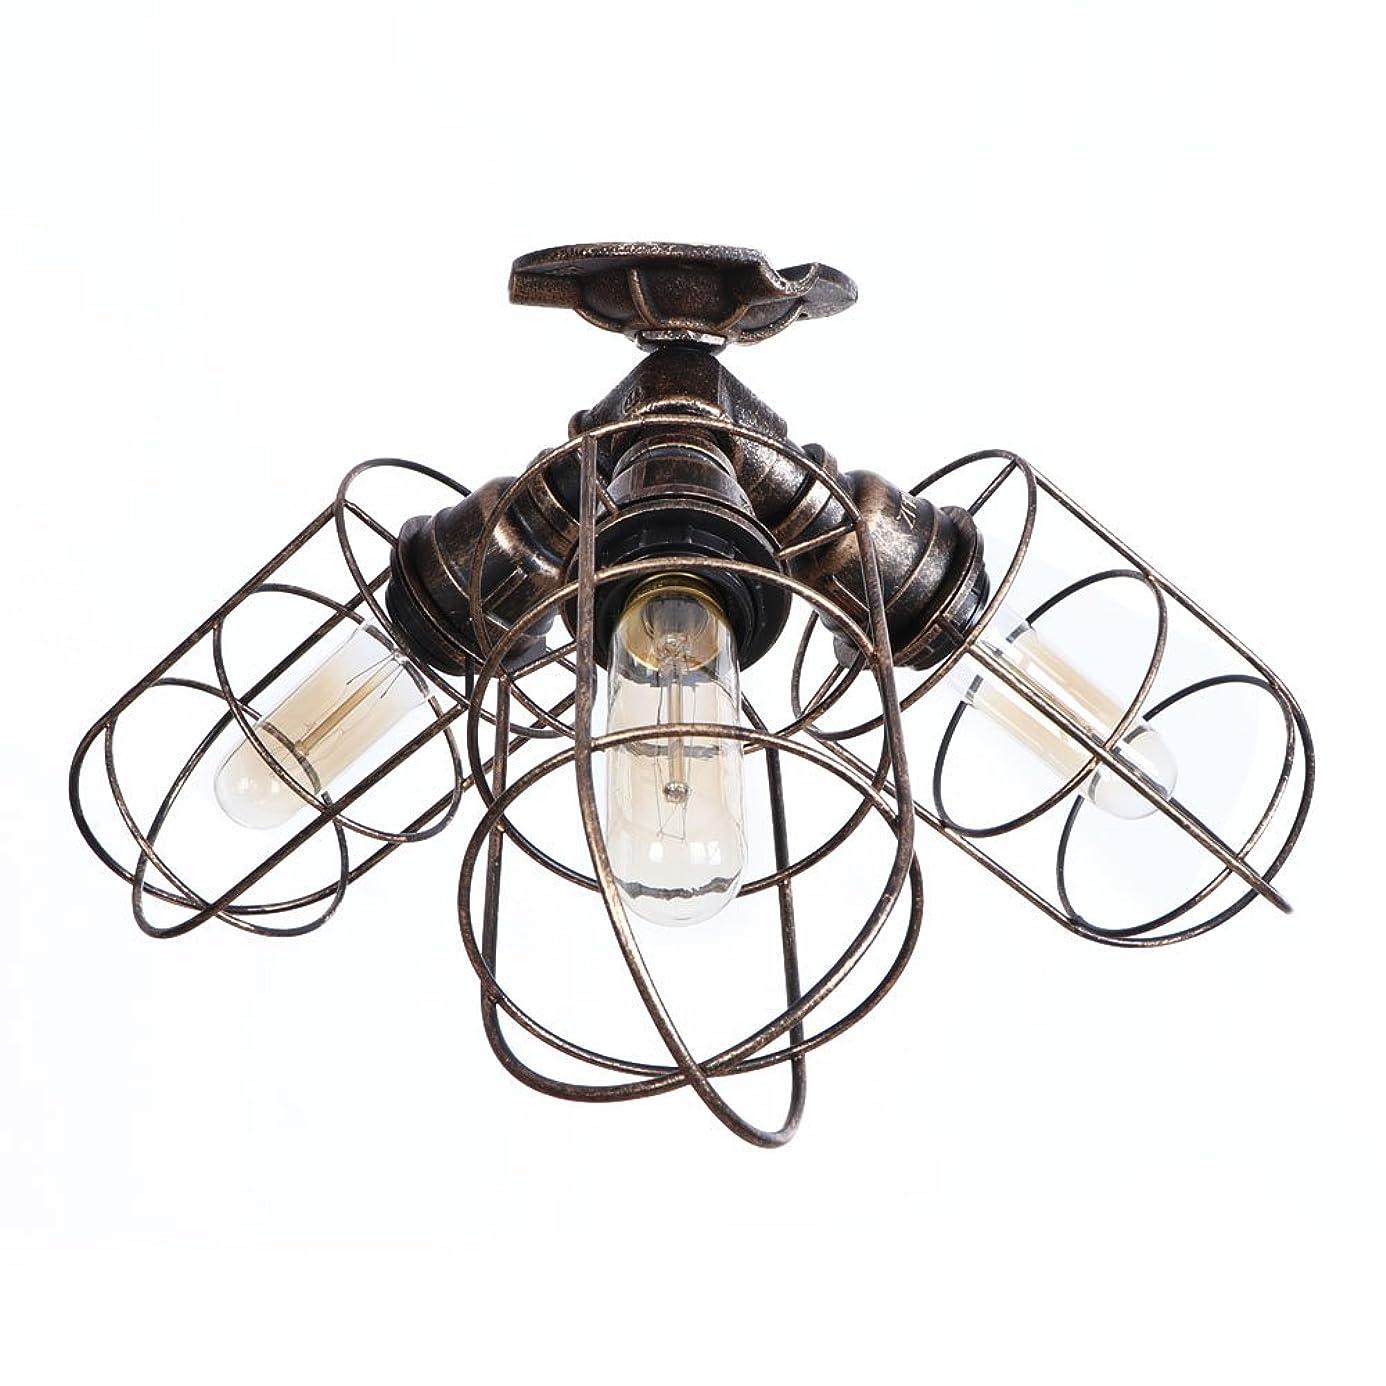 HKYK Retro Ceiling Lamp, 3-Light Wrought Iron Flush Mount Ceiling Light Water Pipe Hanging Luminaire Foyer Hallway Bedroom Kitchen Farmhouse Suspension Light E27